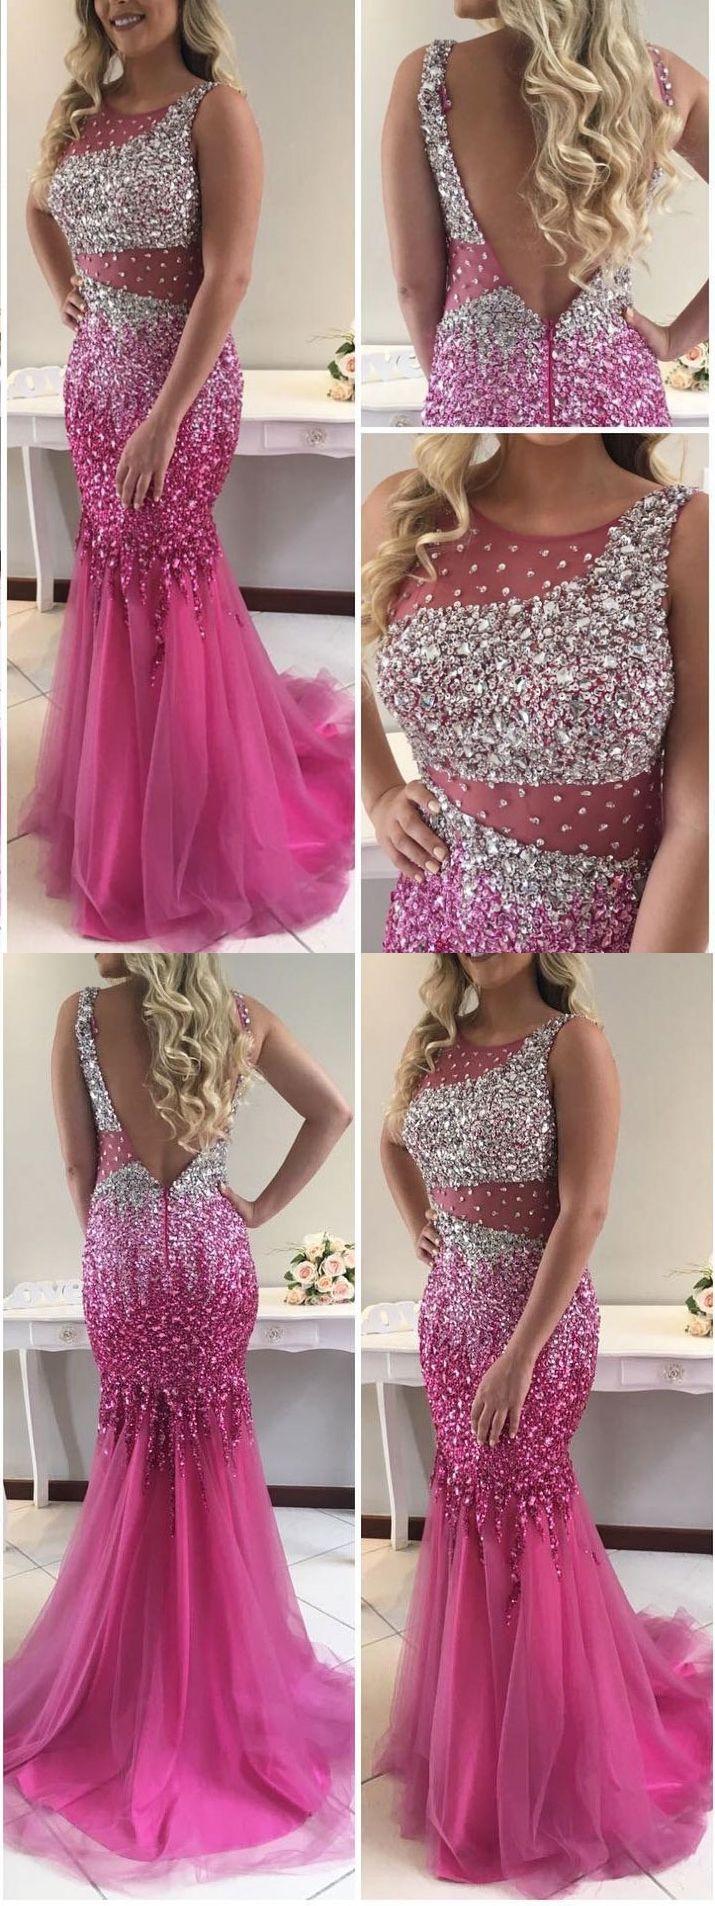 Mermaid prom dresses with shine beaded,long prom dresses,pageant dresses,mermaid evening dresses